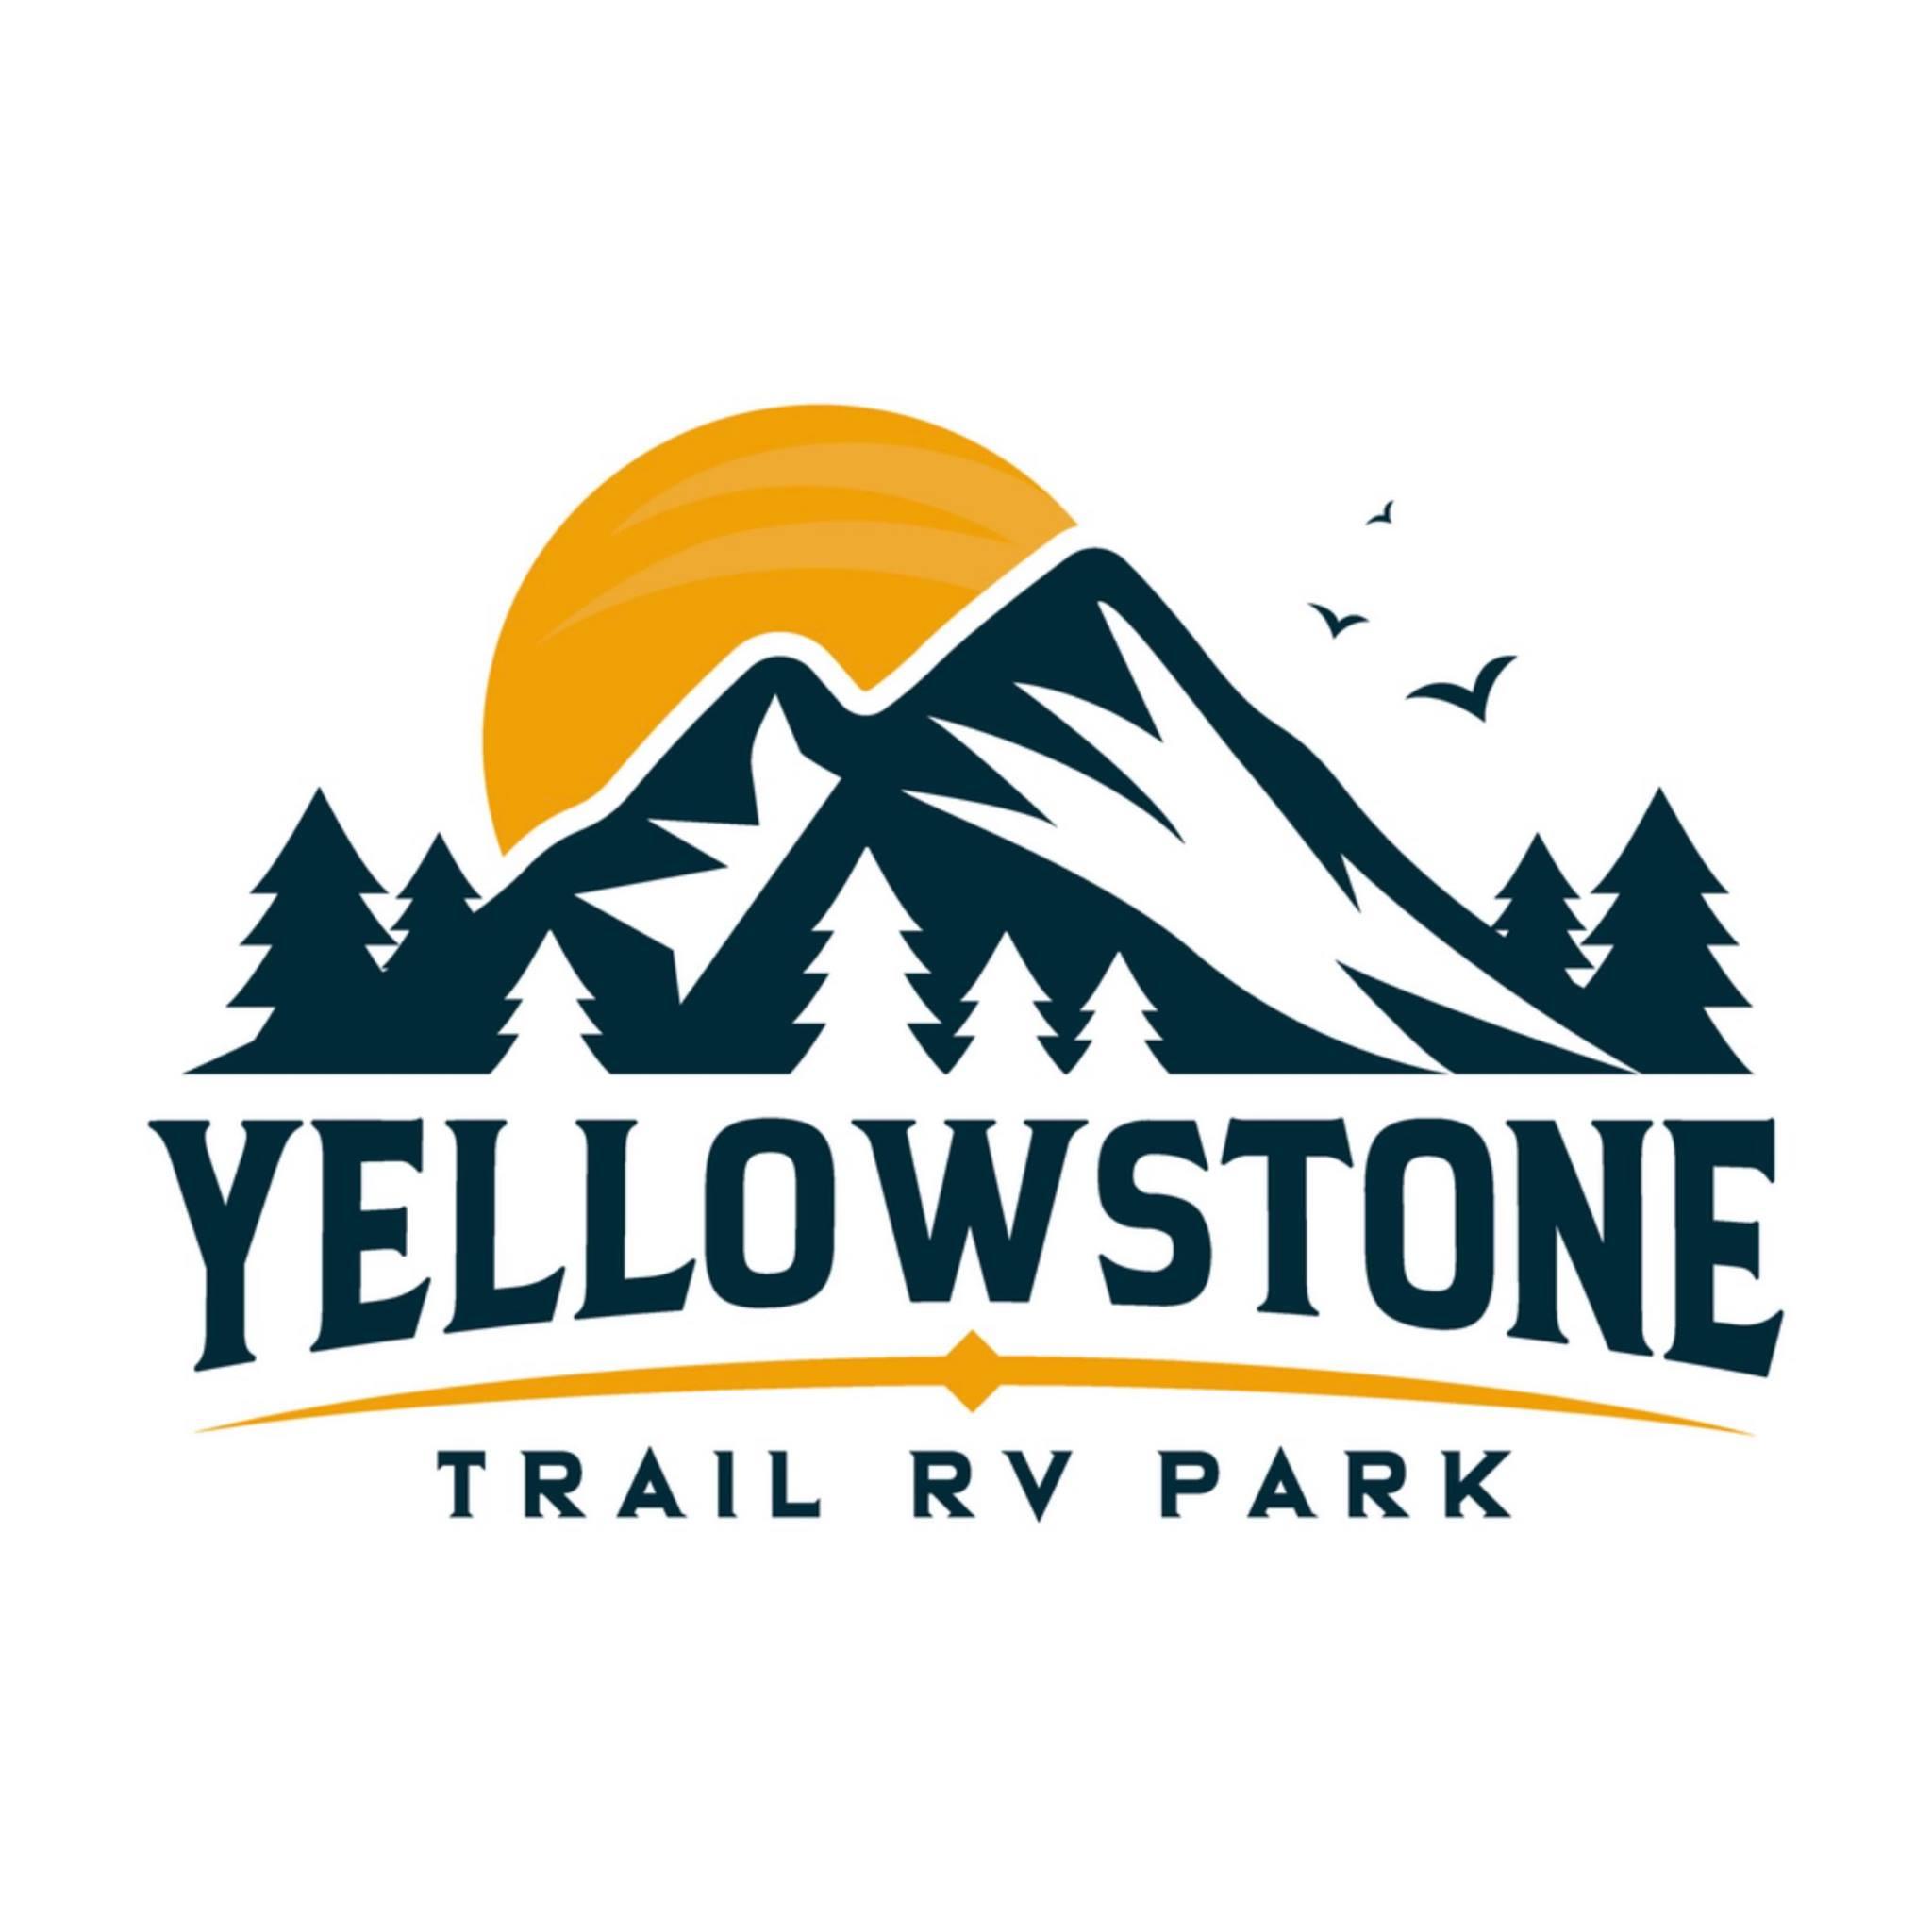 Yellowstone Trail RV Park